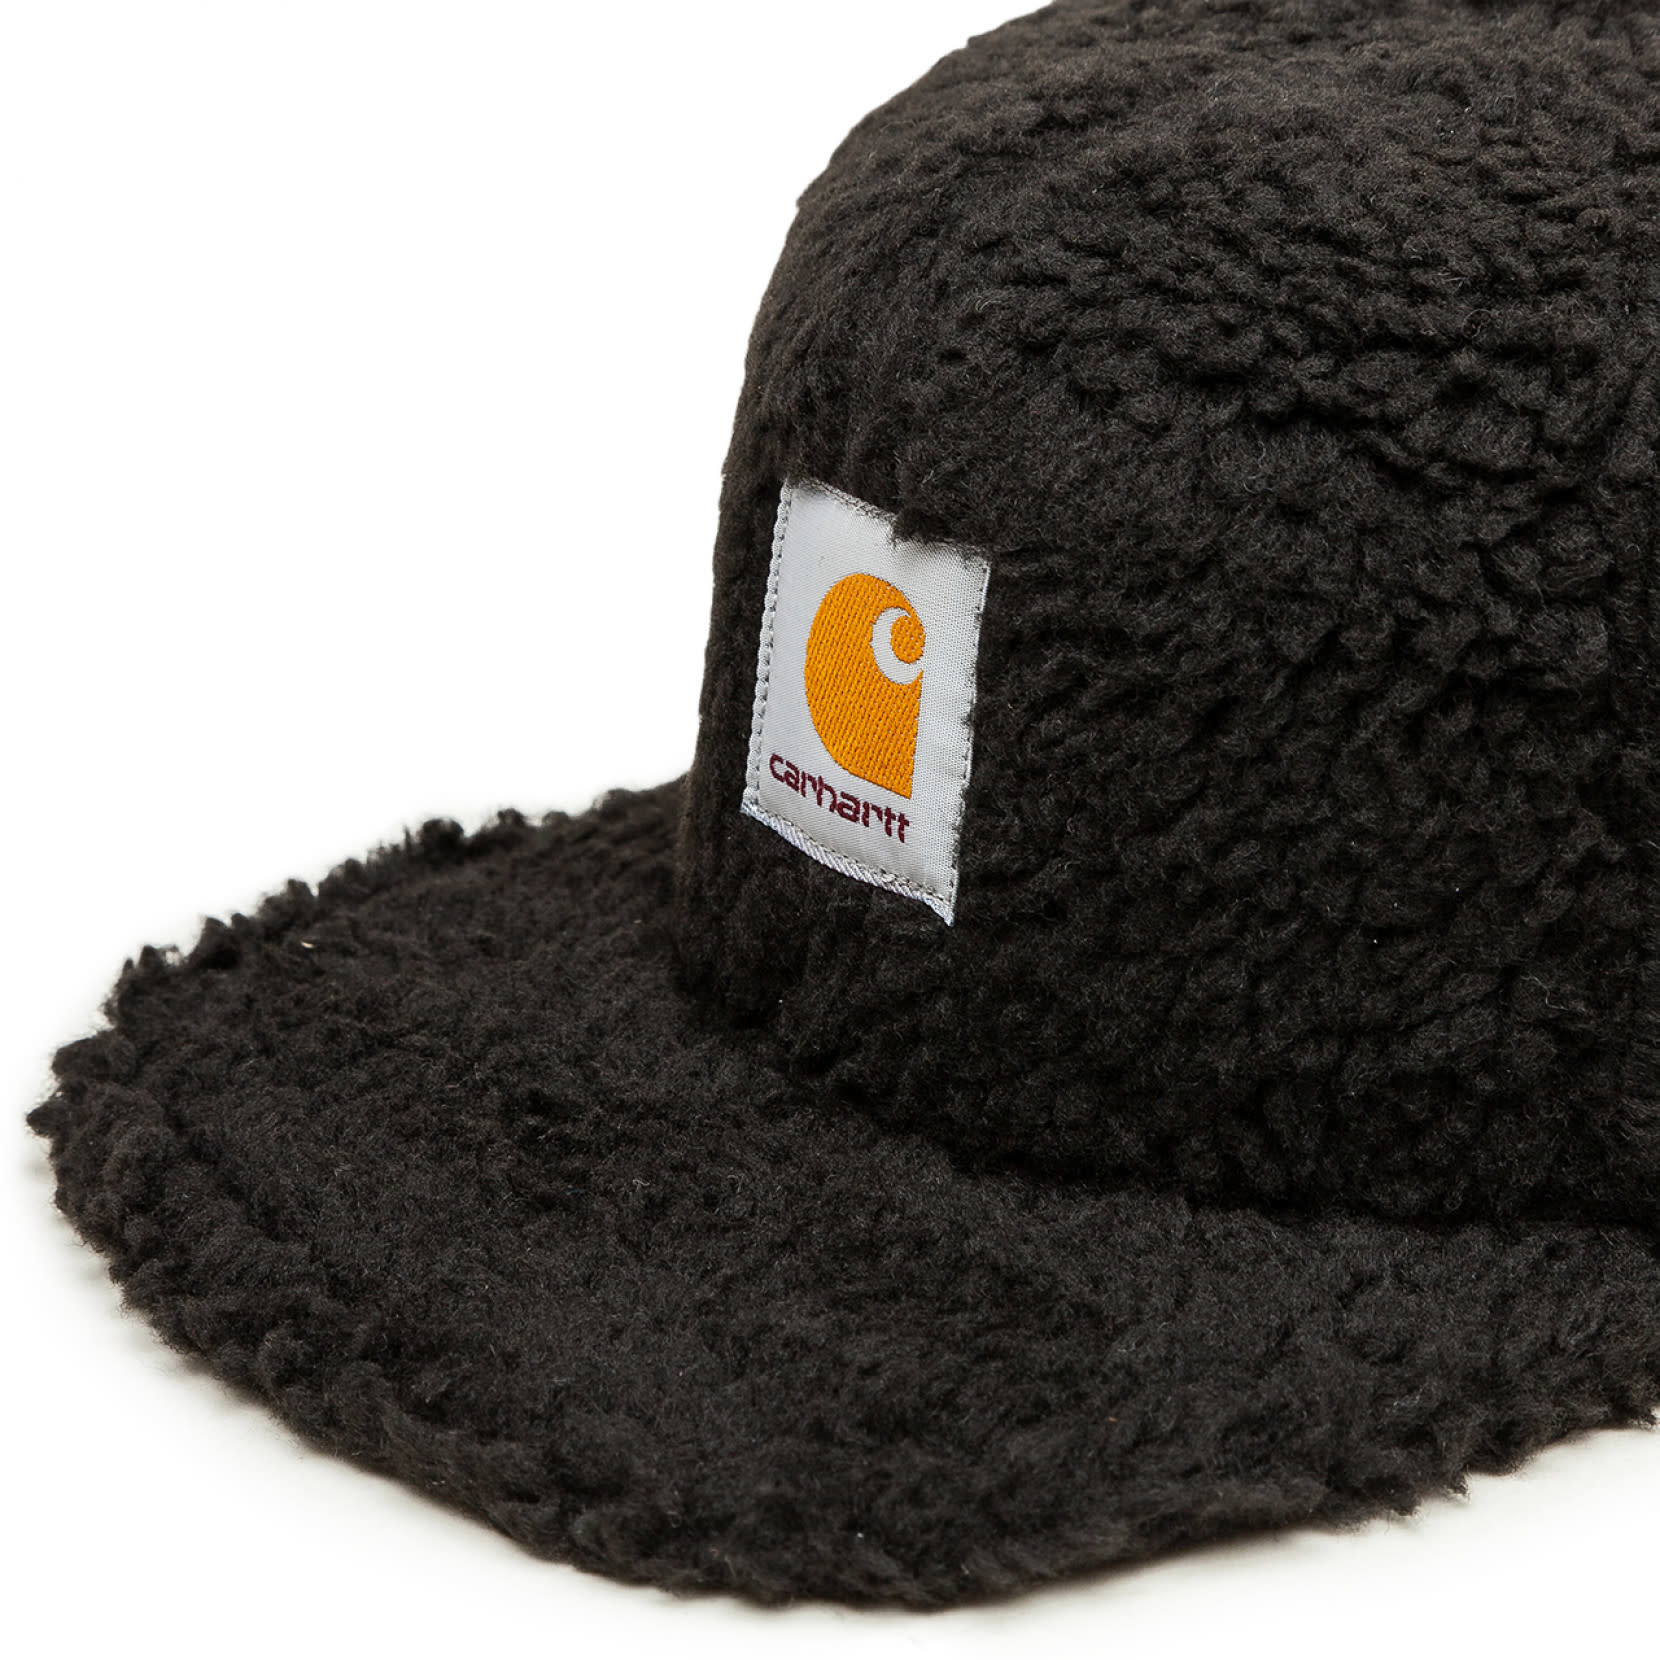 Carhartt Work In Progress Northfield Fleece Cap in Black